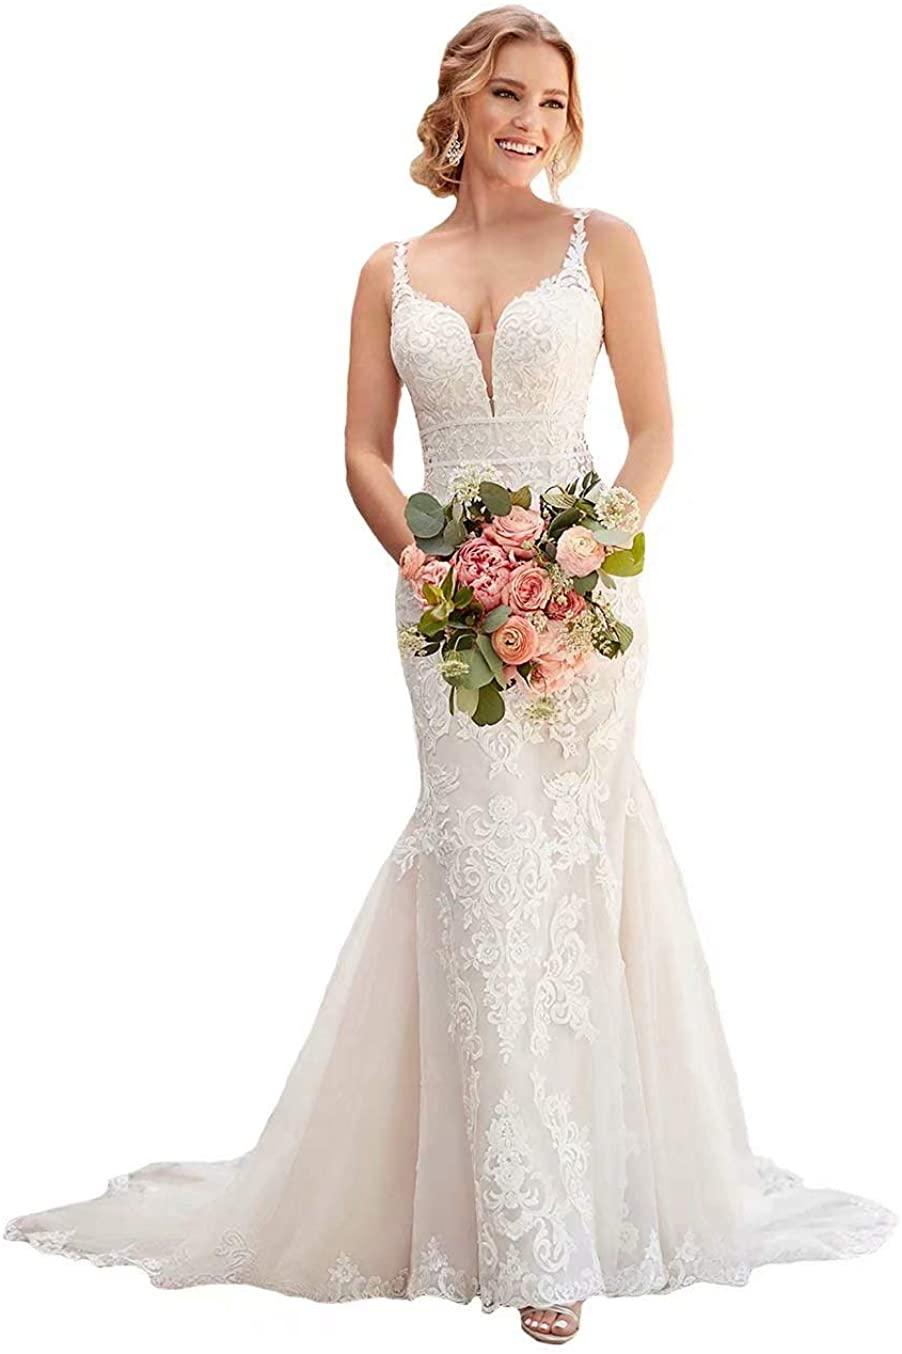 Women's Lace Wedding Dresses Mermaid V-Neck Long Open Back Beach Bridal Dress for Bride 2020